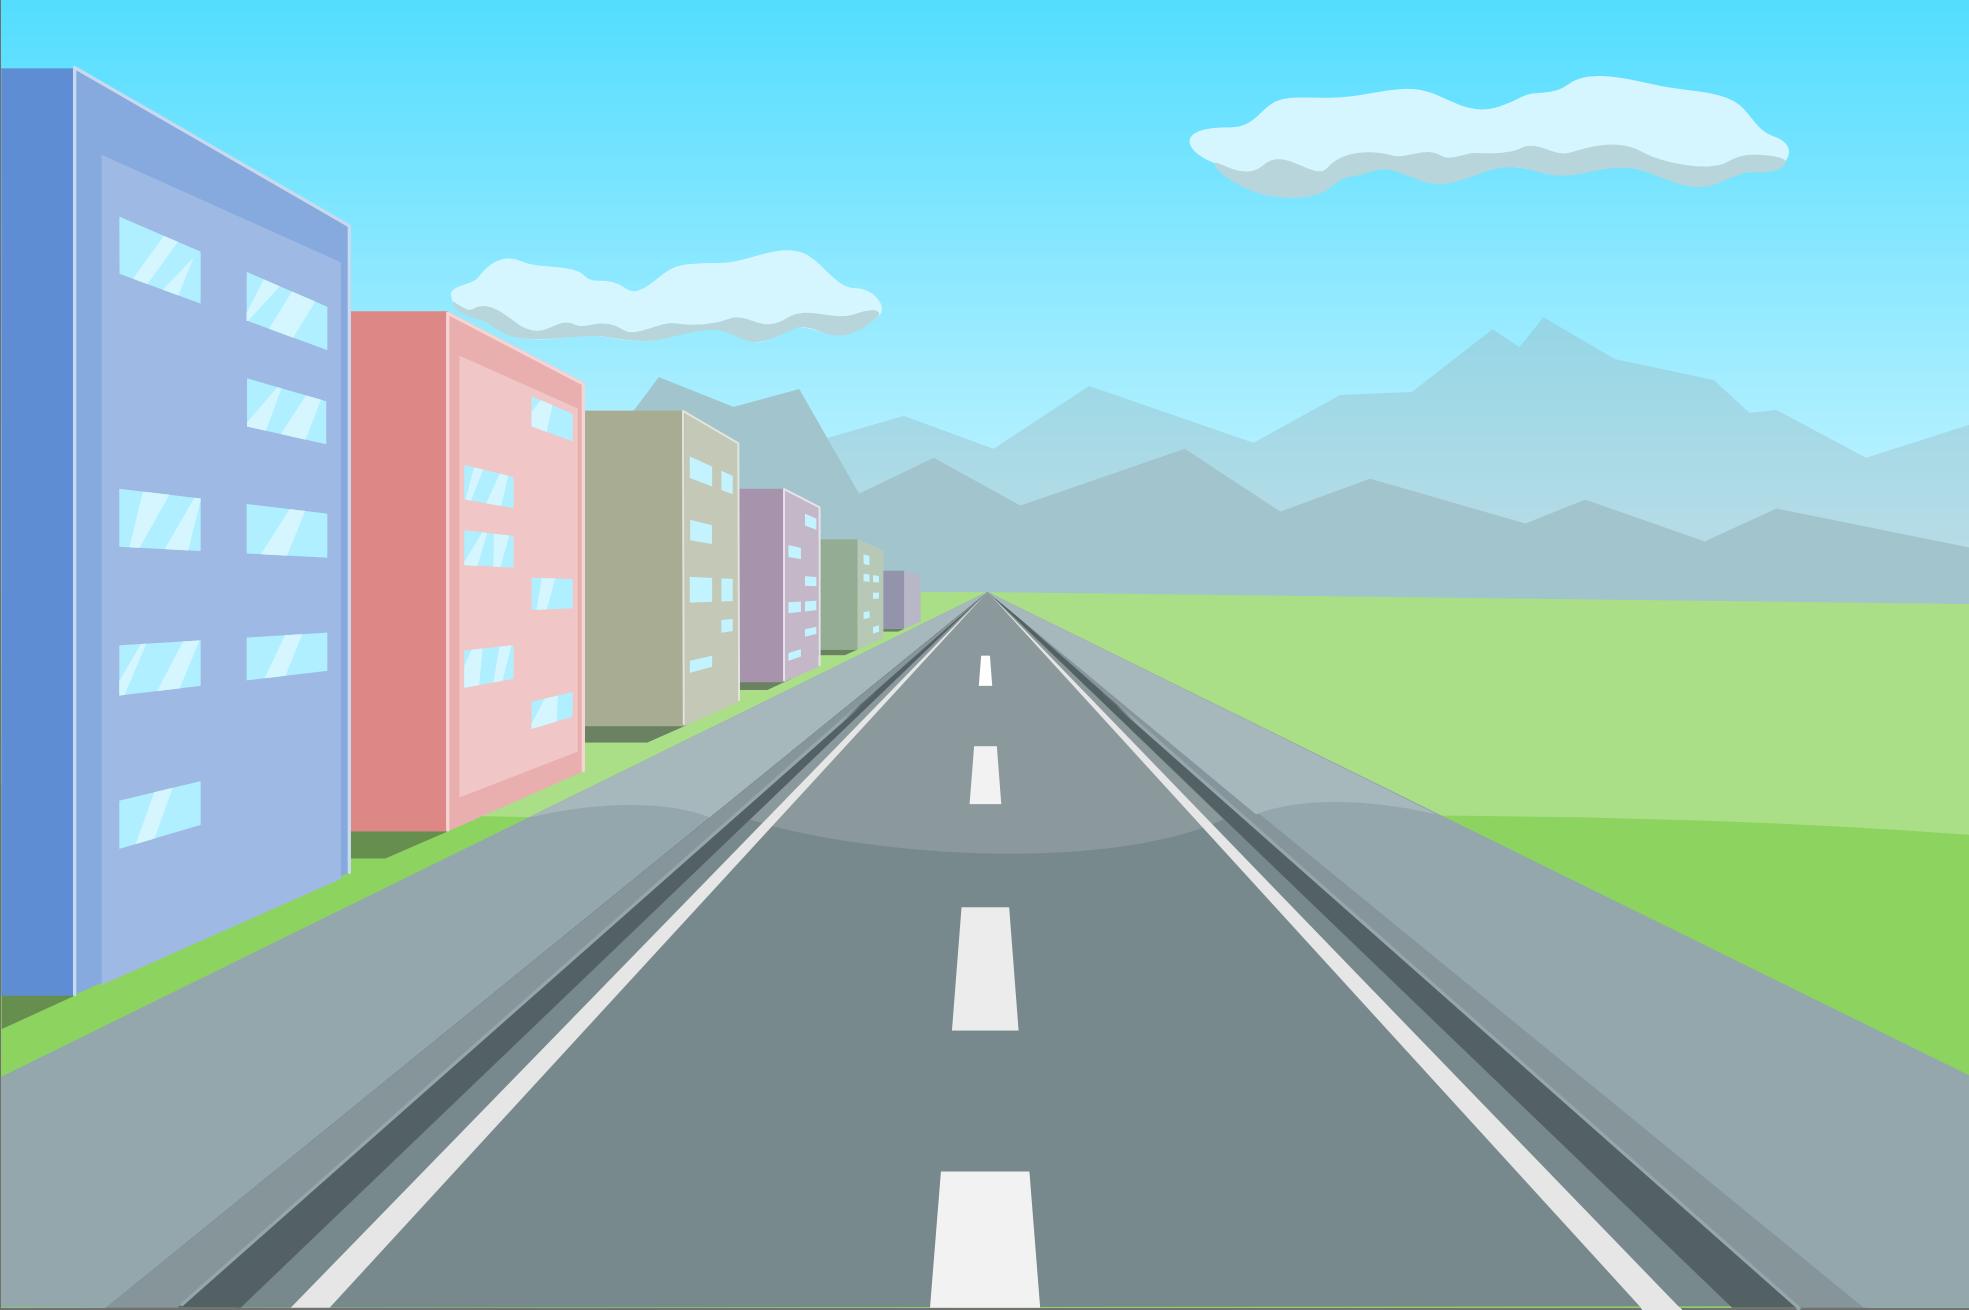 Free Open Road Cliparts, Download Free Clip Art, Free Clip.